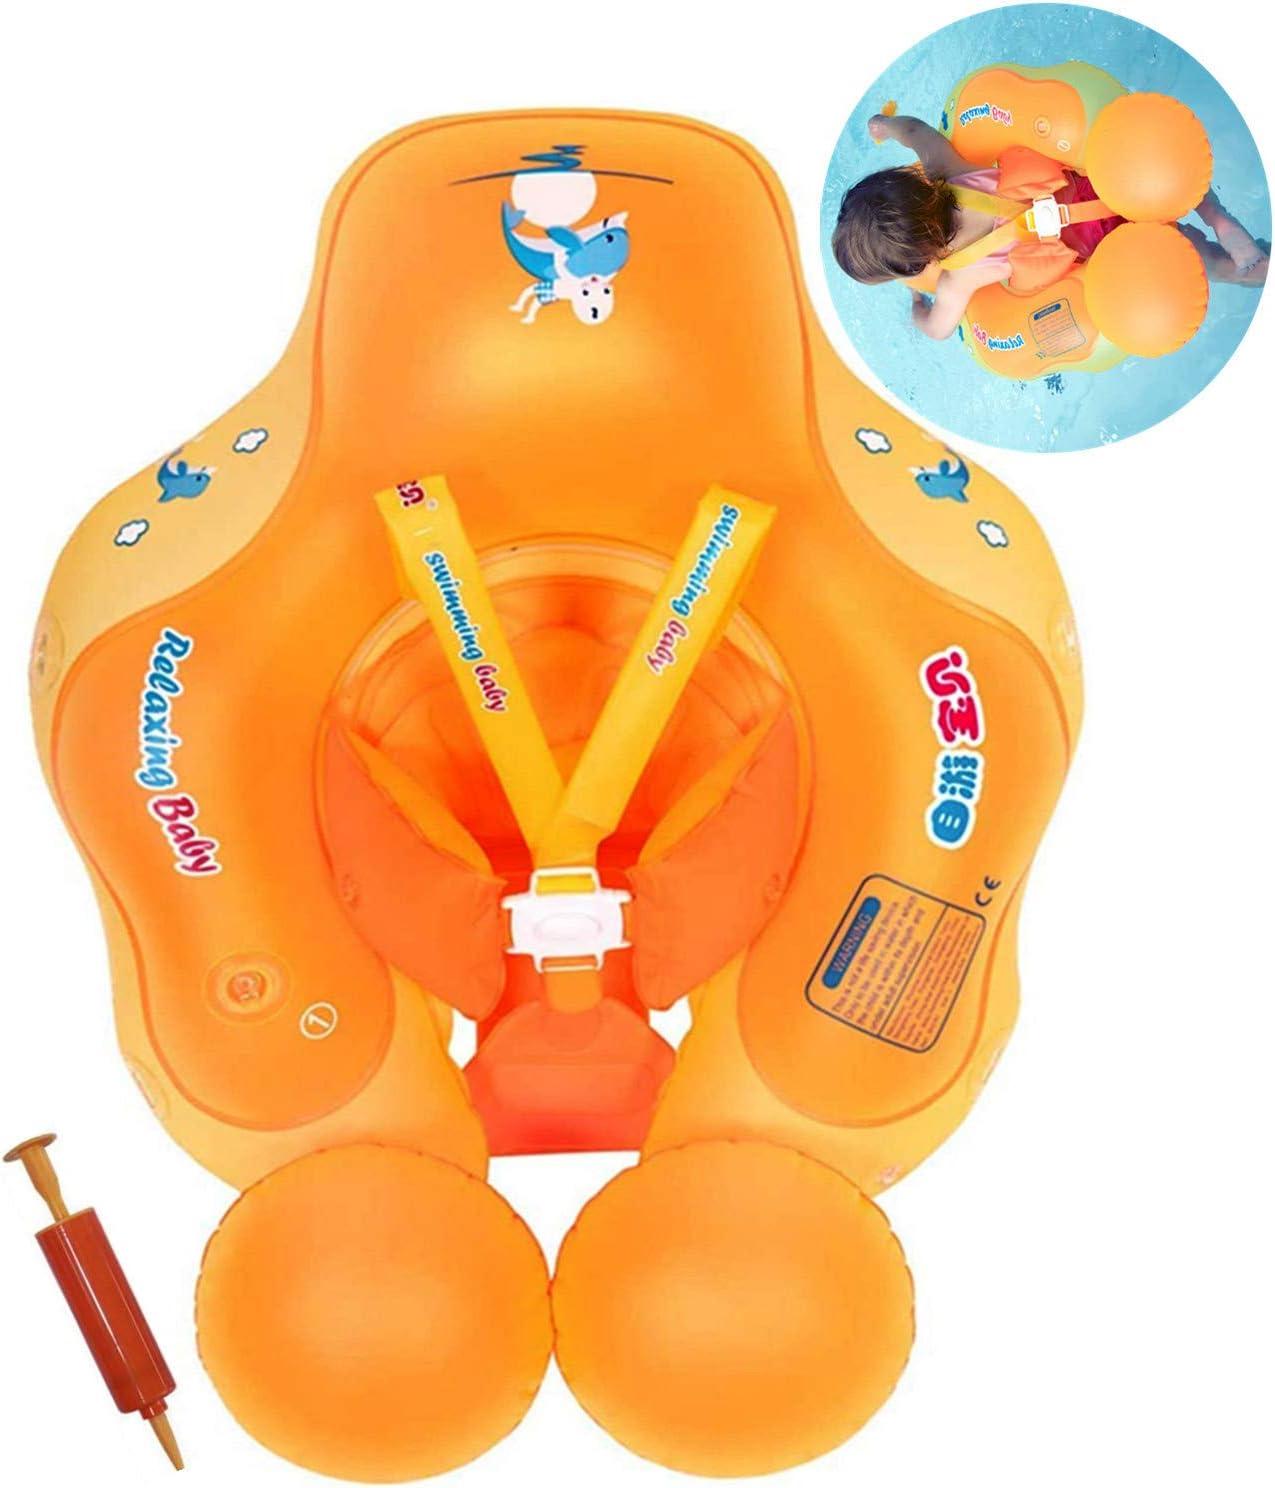 Flotador de Natación para Bebés con Asiento Anillo,Bebé Recién Nacido Aprende a Nadar Entrenador Inflable Flotador Ajustable para Piscinas para Bebés,Anillo de Natación para Bebés (6-36 Meses,L)